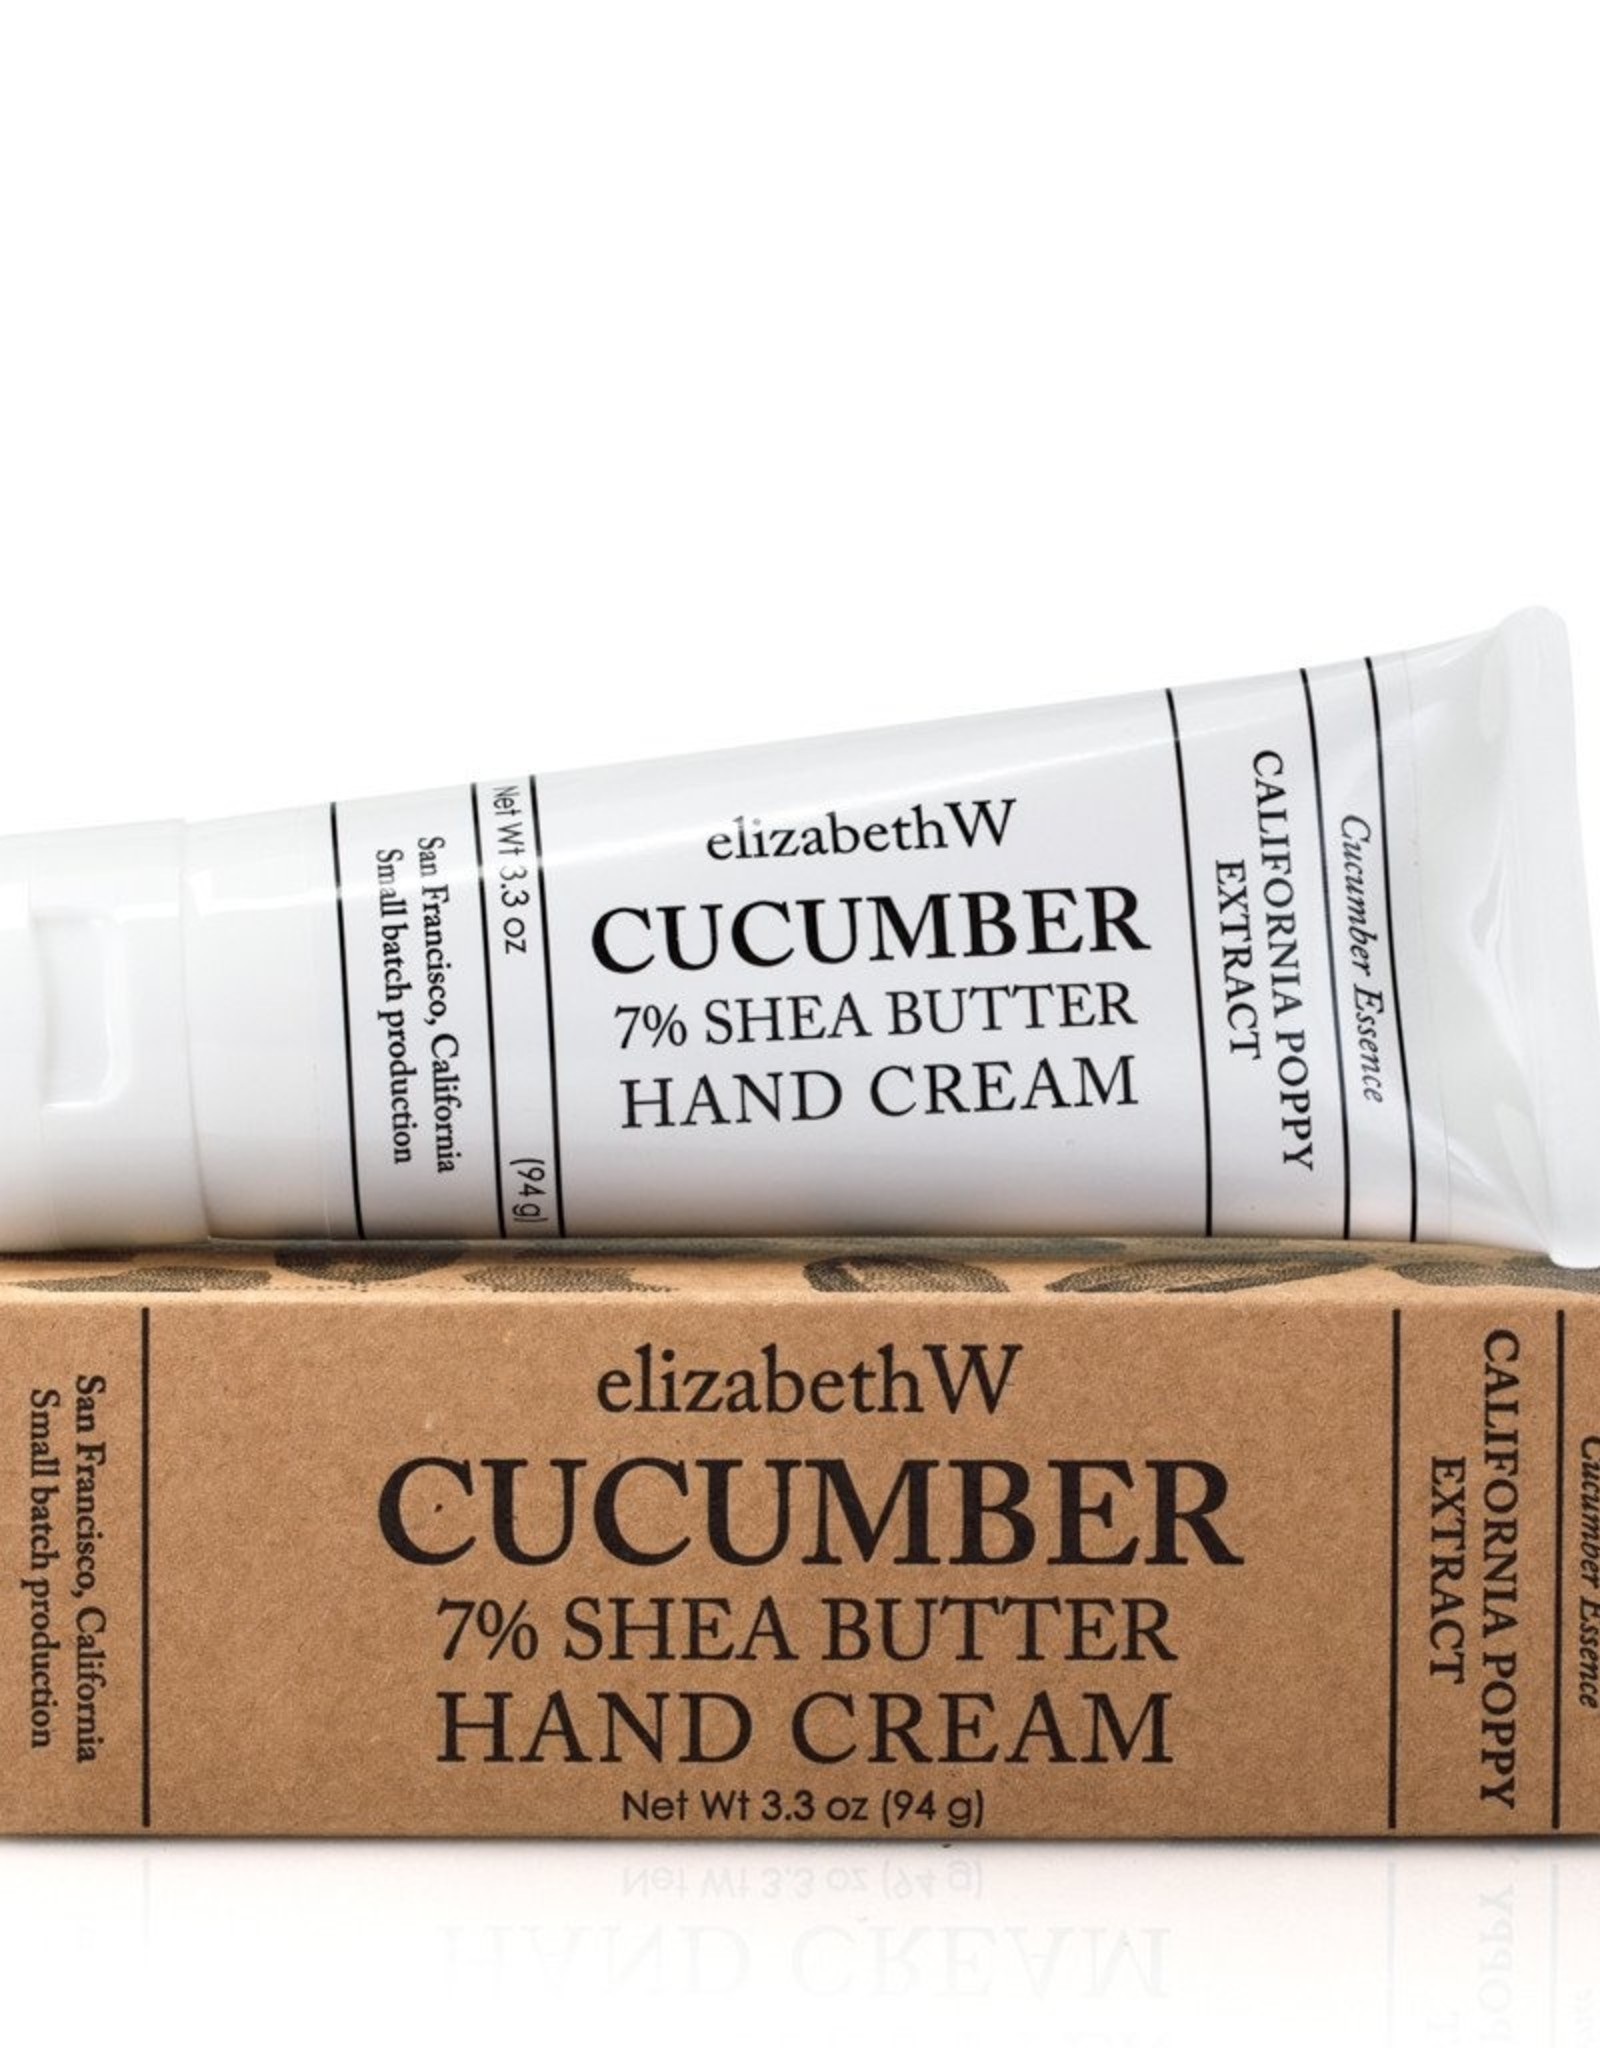 Elizabeth W Cucumber Hand Cream